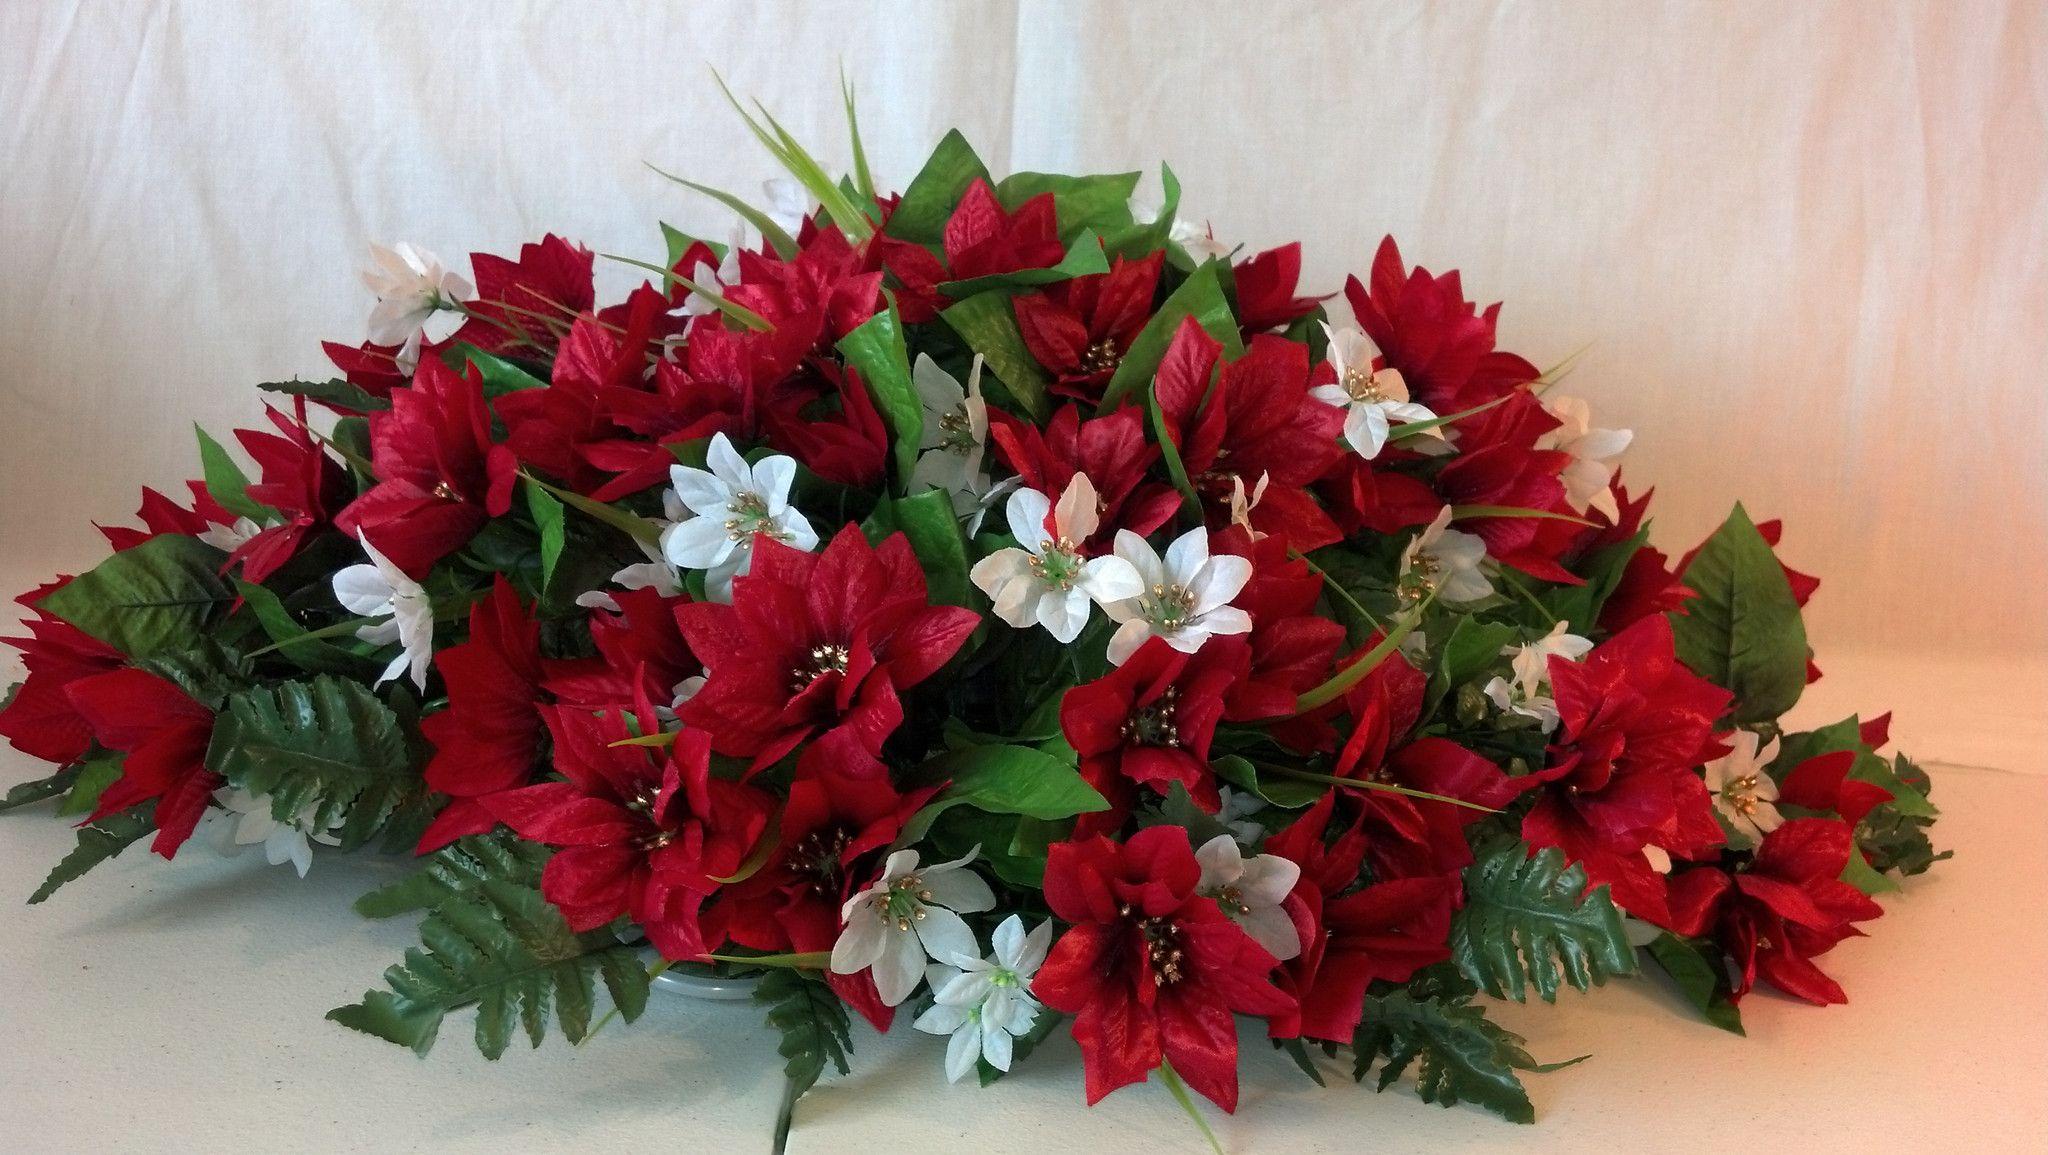 Premium Poinsettia Headstone Spray For Christmas Christmas Flower Arrangements Flower Arrangements Diy Artificial Flower Arrangements